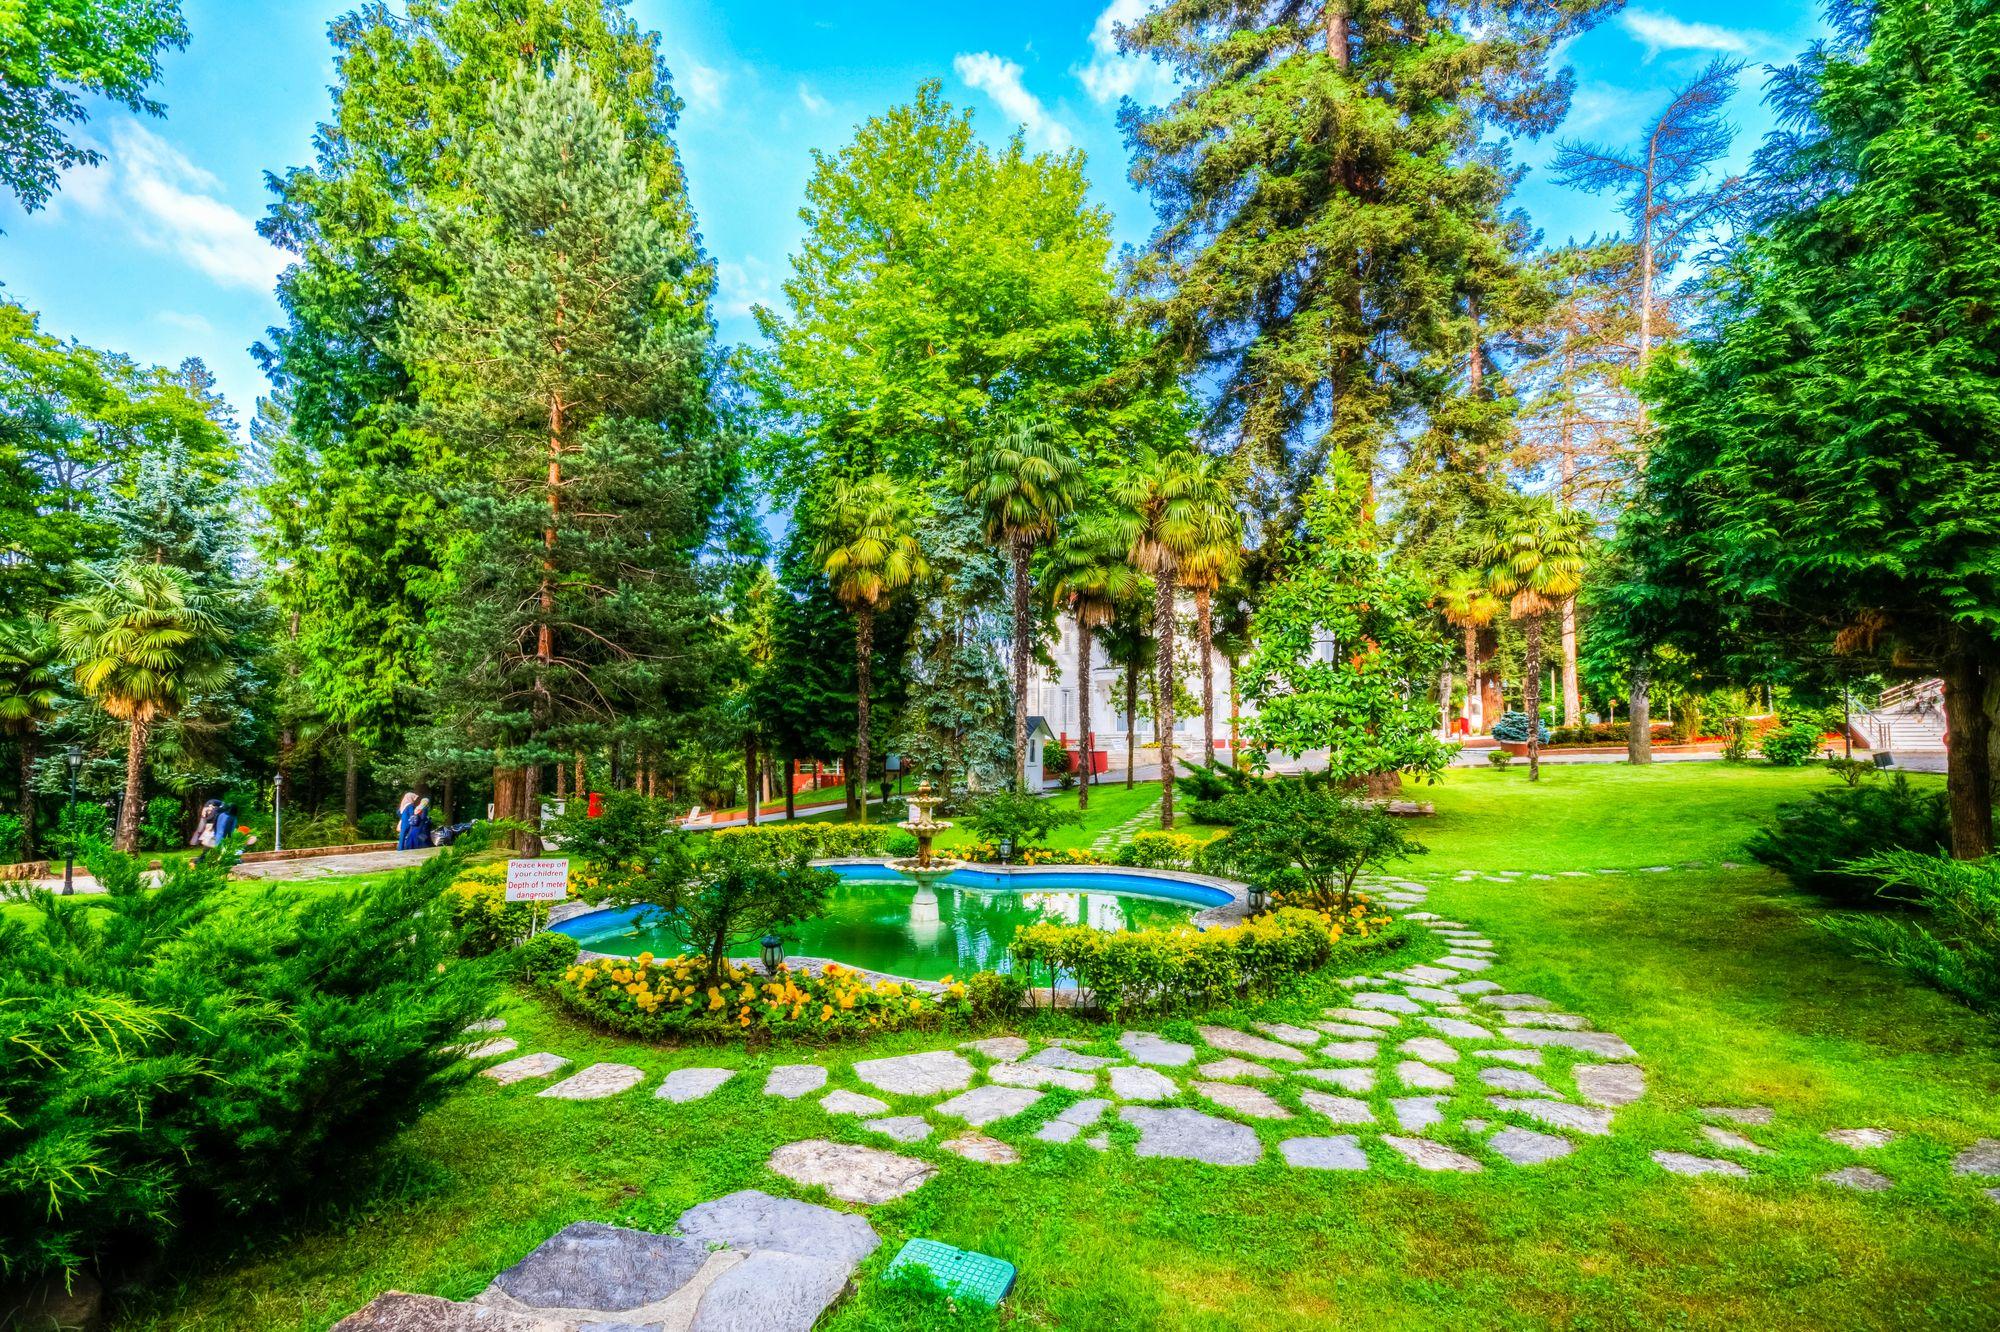 Yalova thermal springs